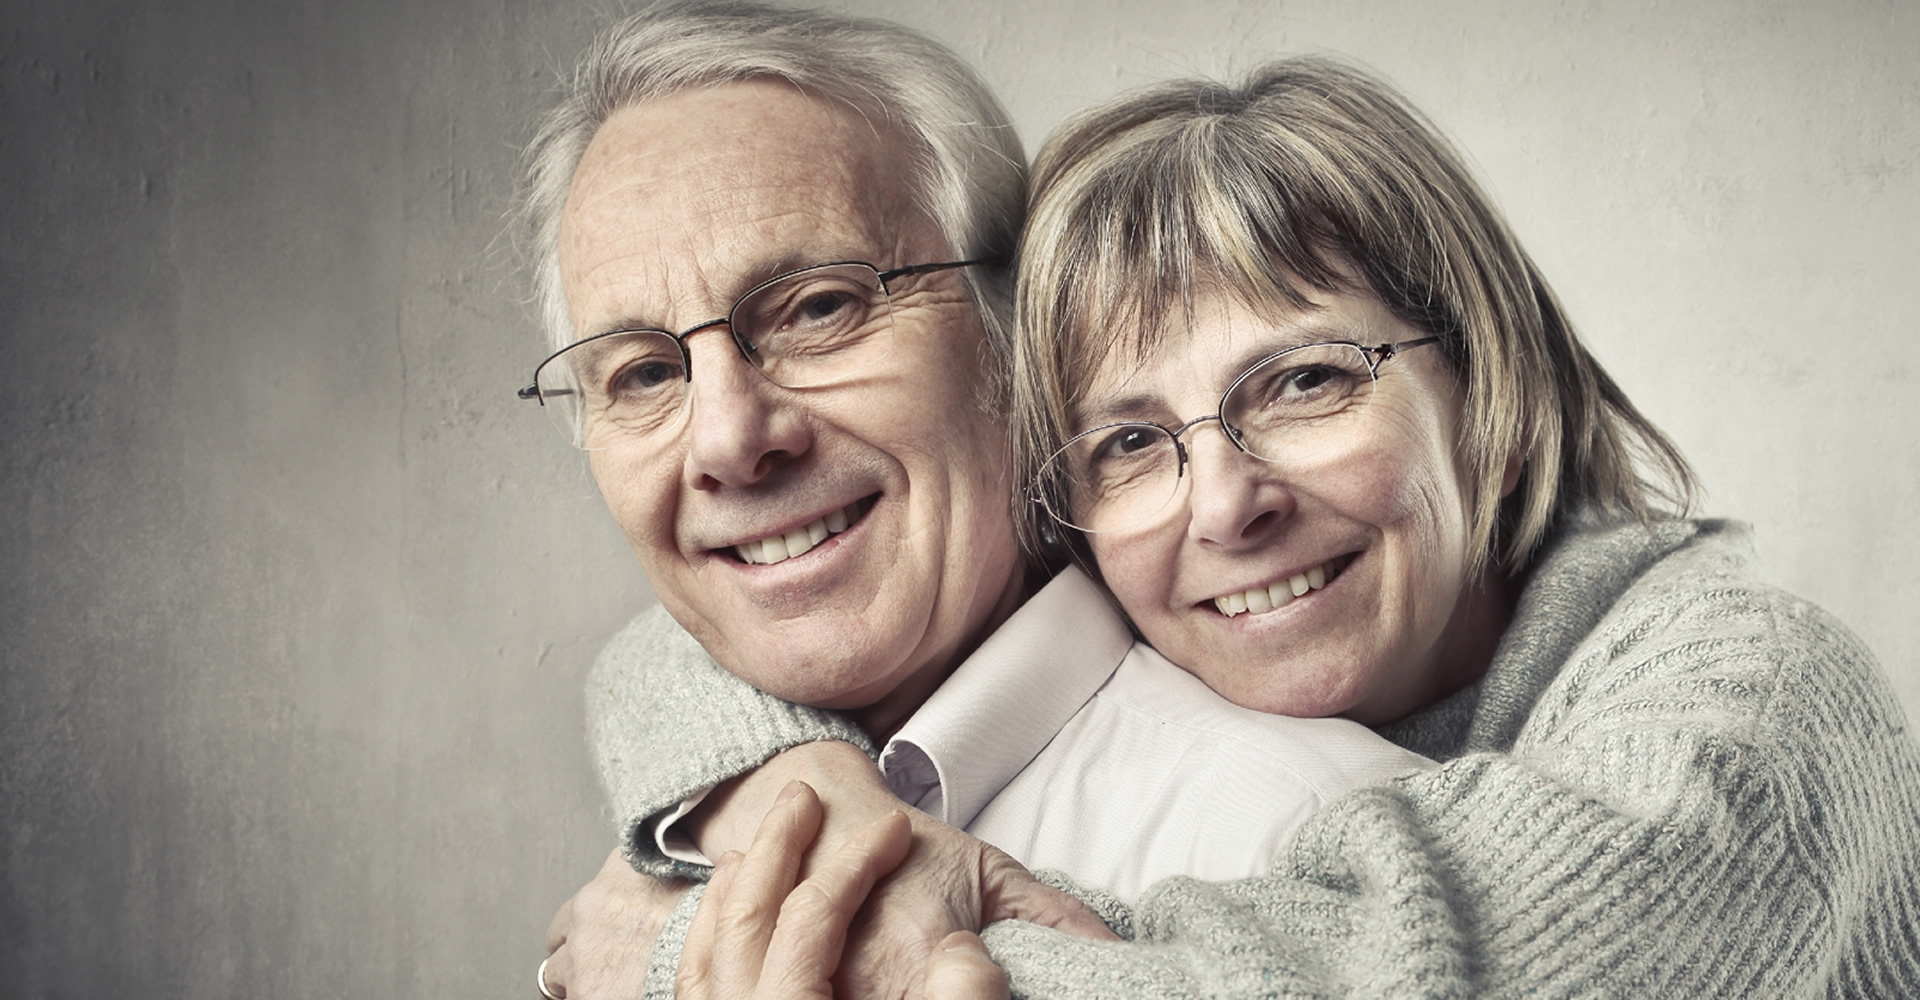 Dentist Sidcup Kent - Dental Implant| Emergency | Cosmetic